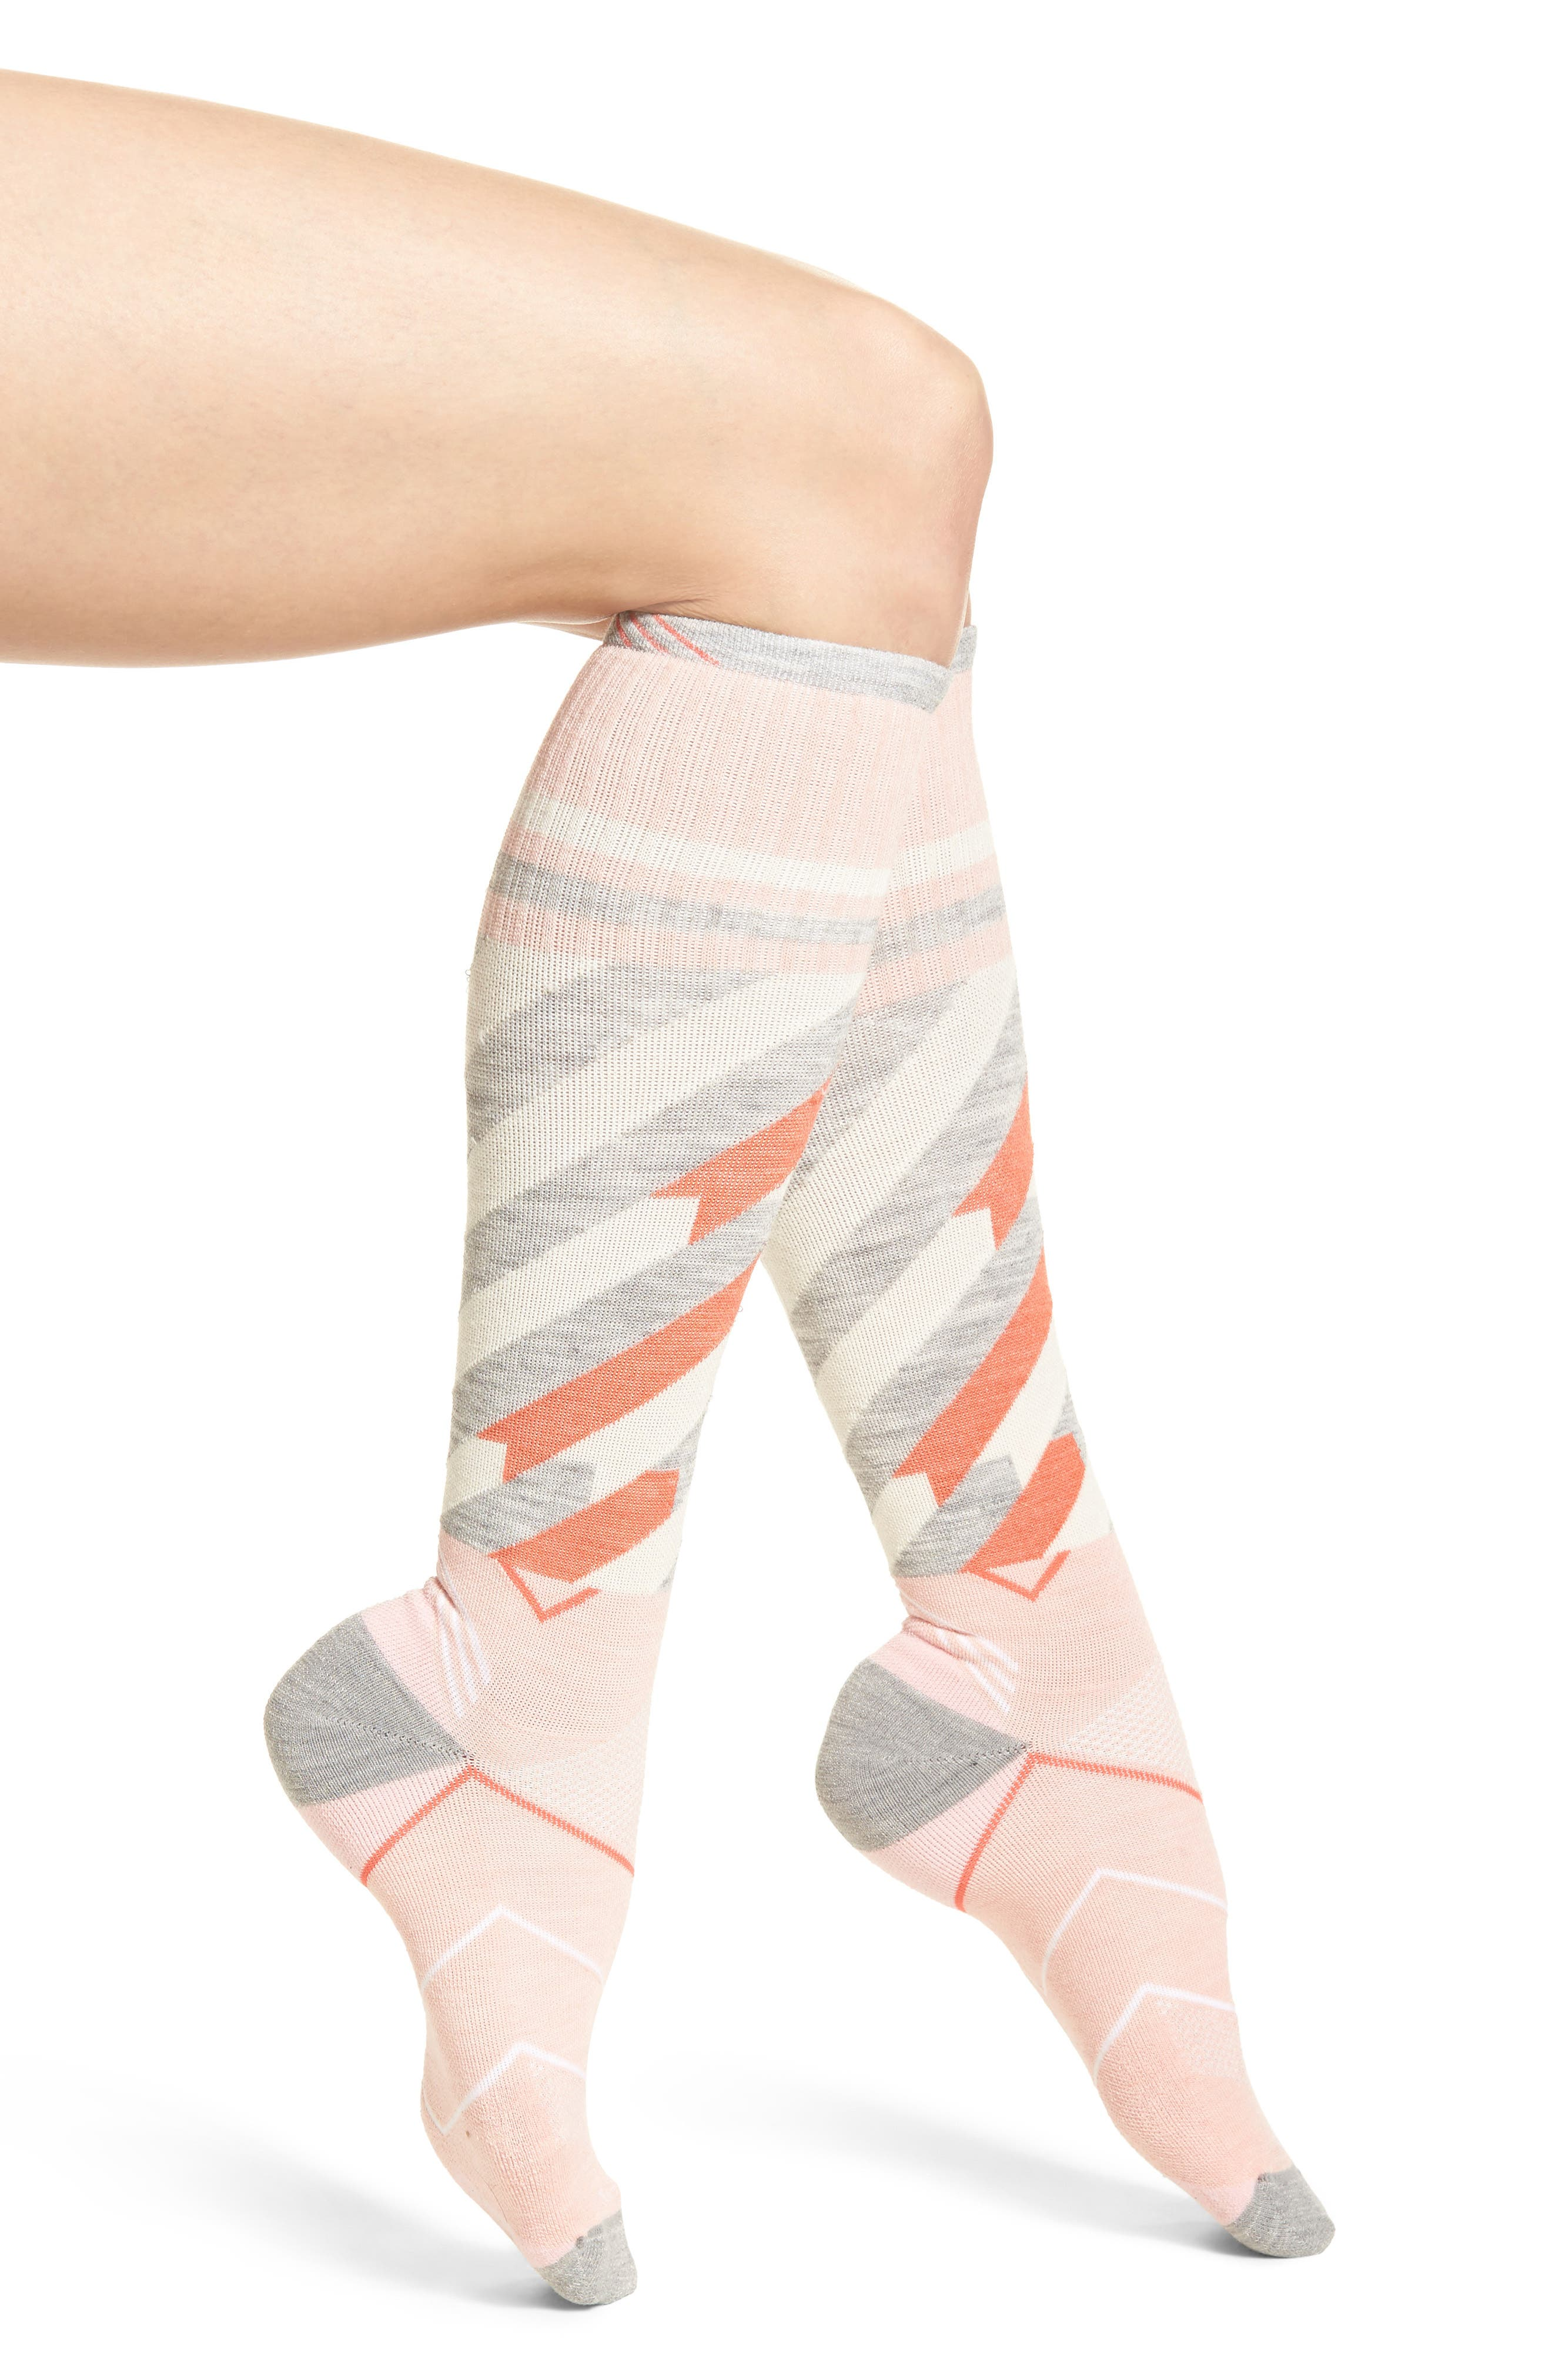 Sockwell Cyclone Compression Knee Socks